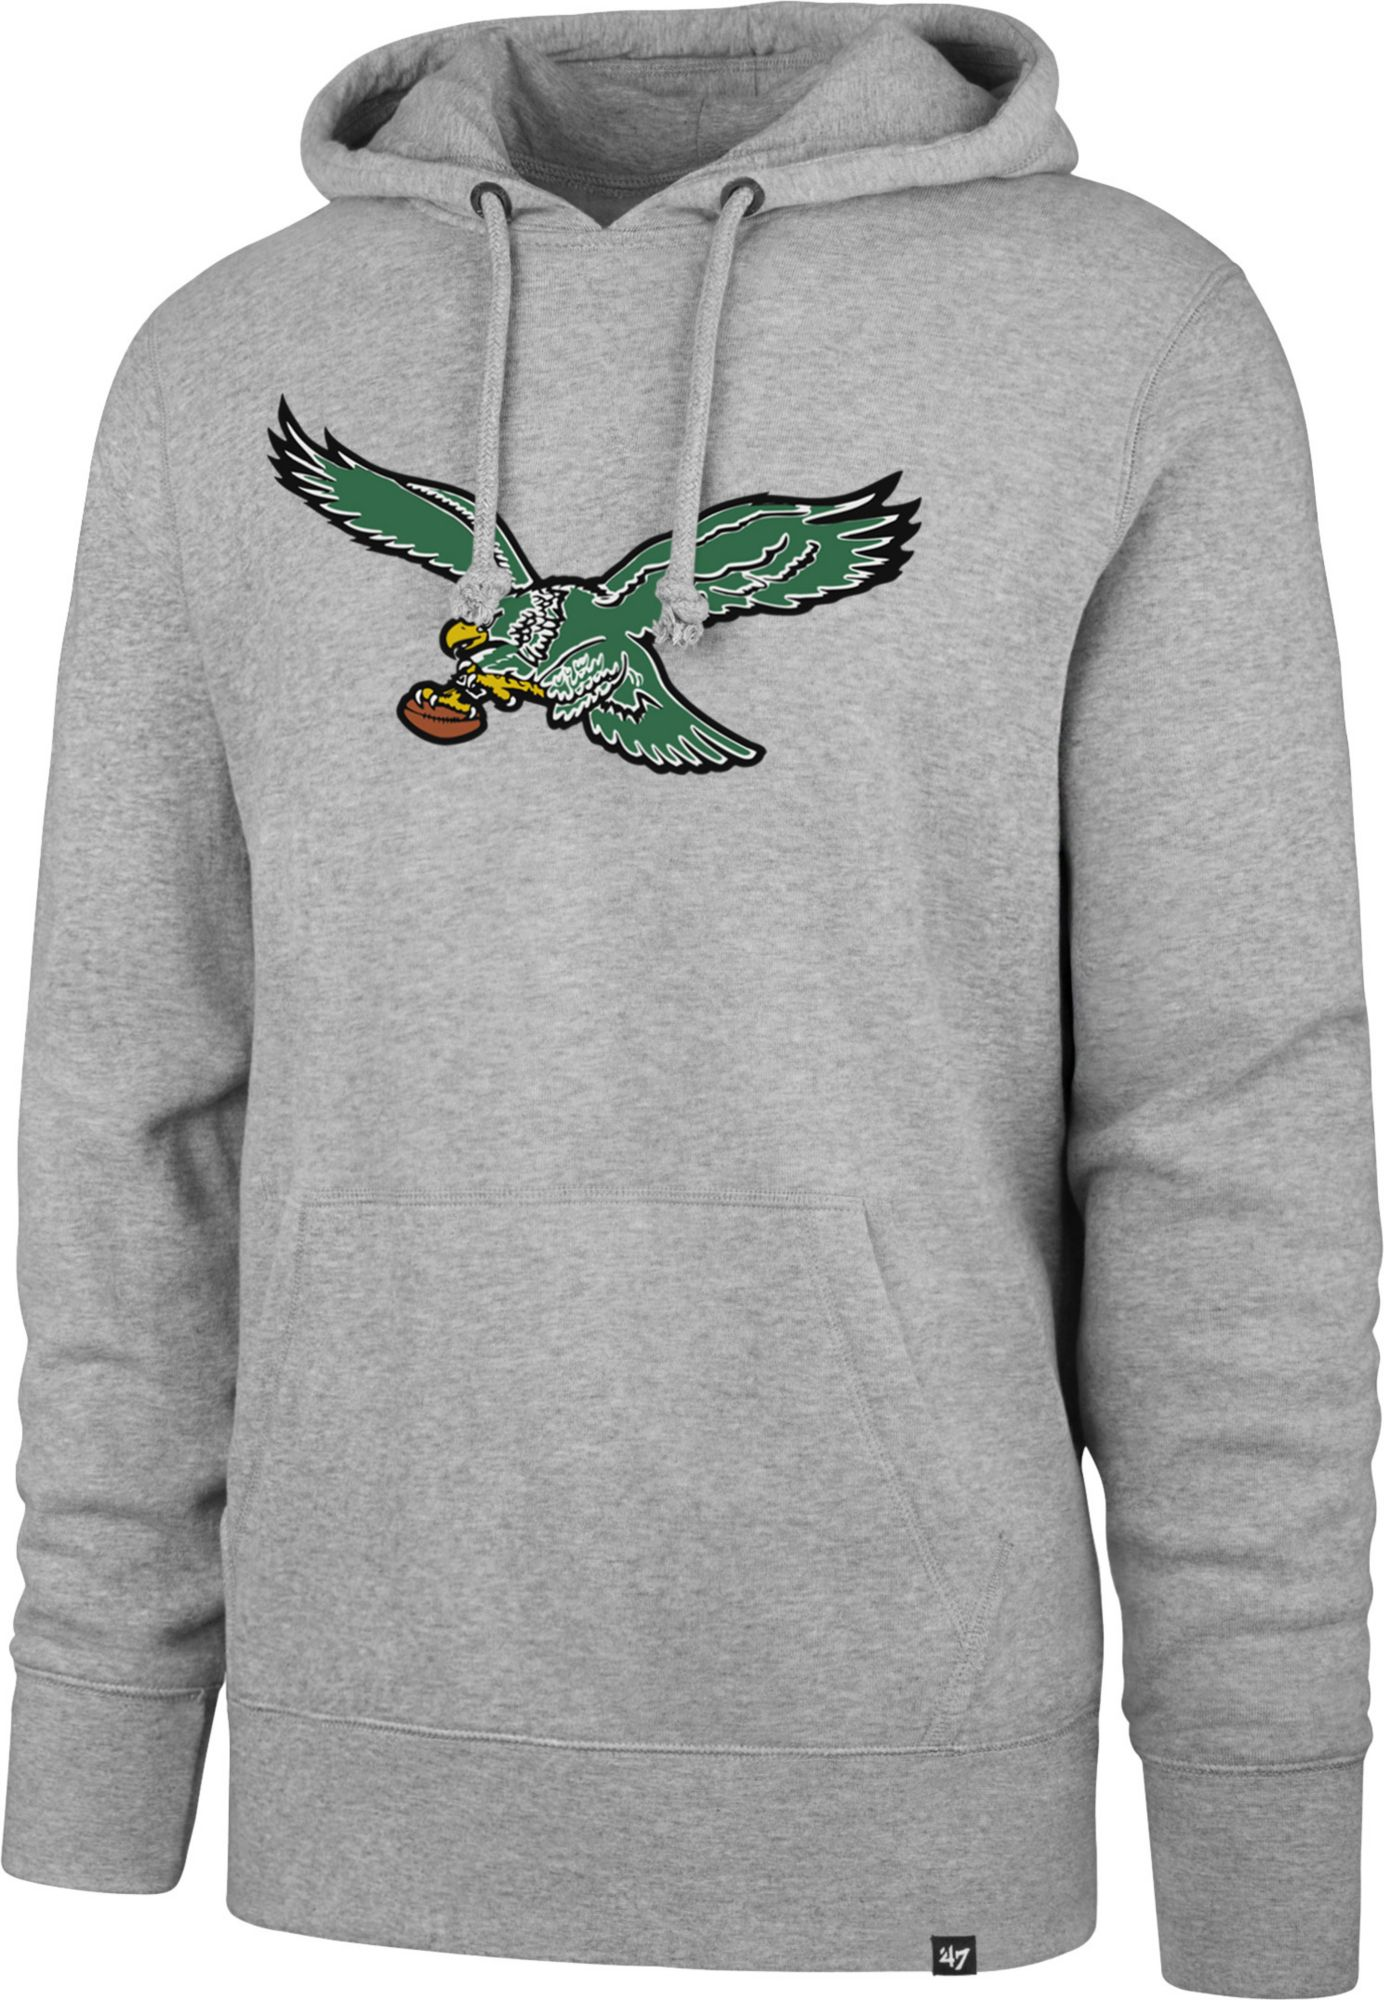 9d34a7e15 47 Men's Philadelphia Eagles Legacy Headline Grey Hoodie   DICK'S ...